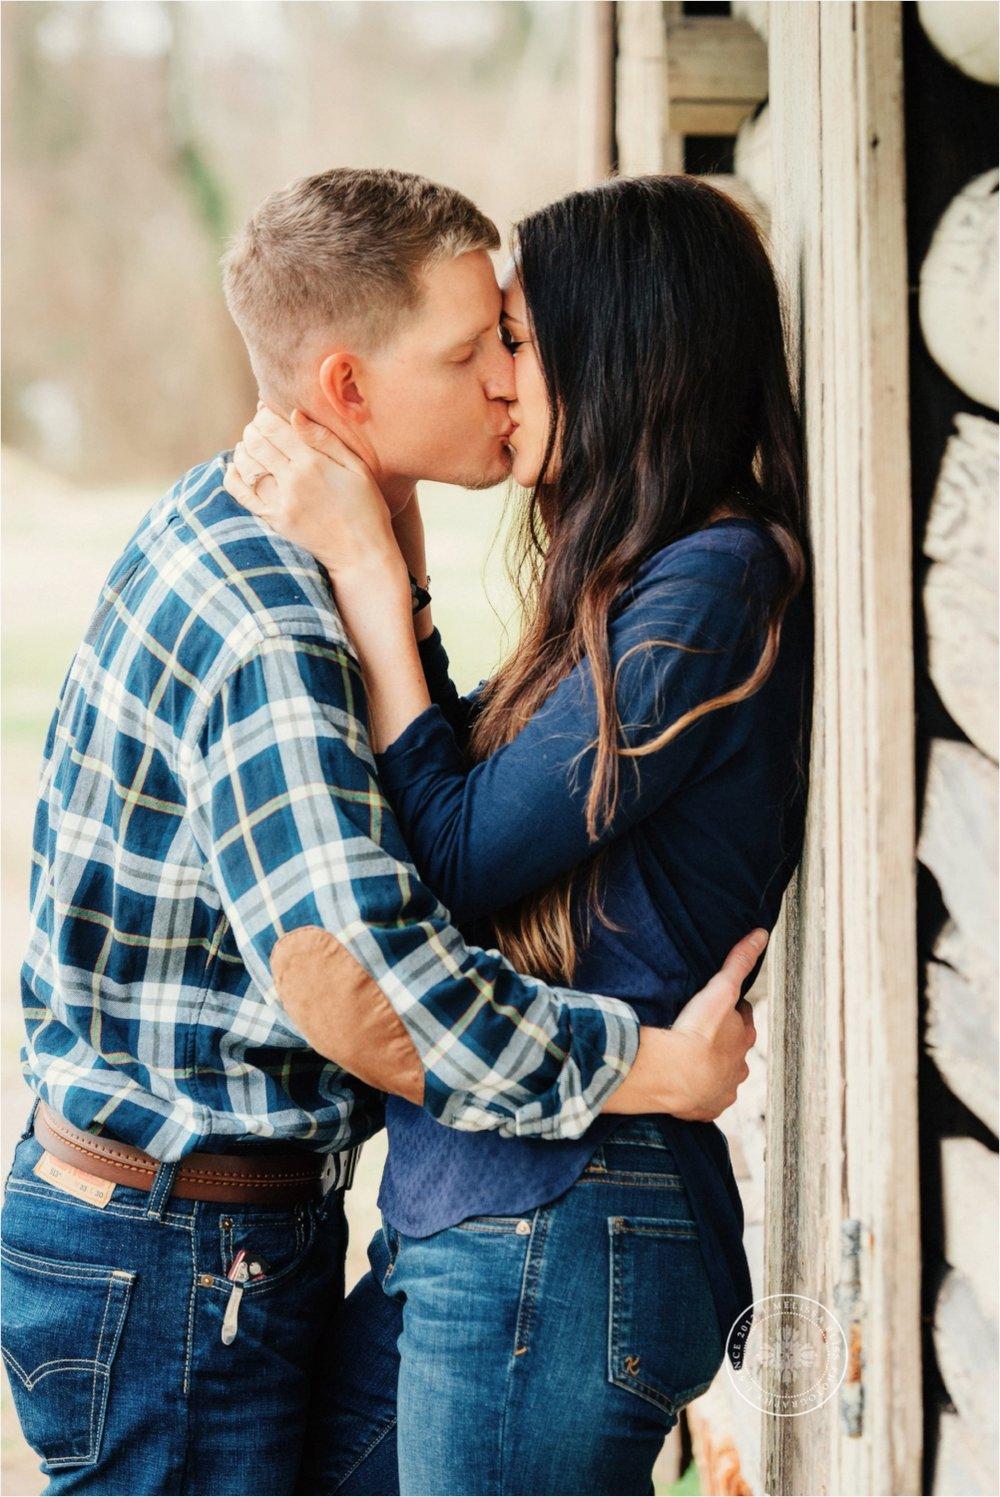 norfolk-engagement-photographer-rustic-engagement-session-in-smithfield-va-romantic-couple